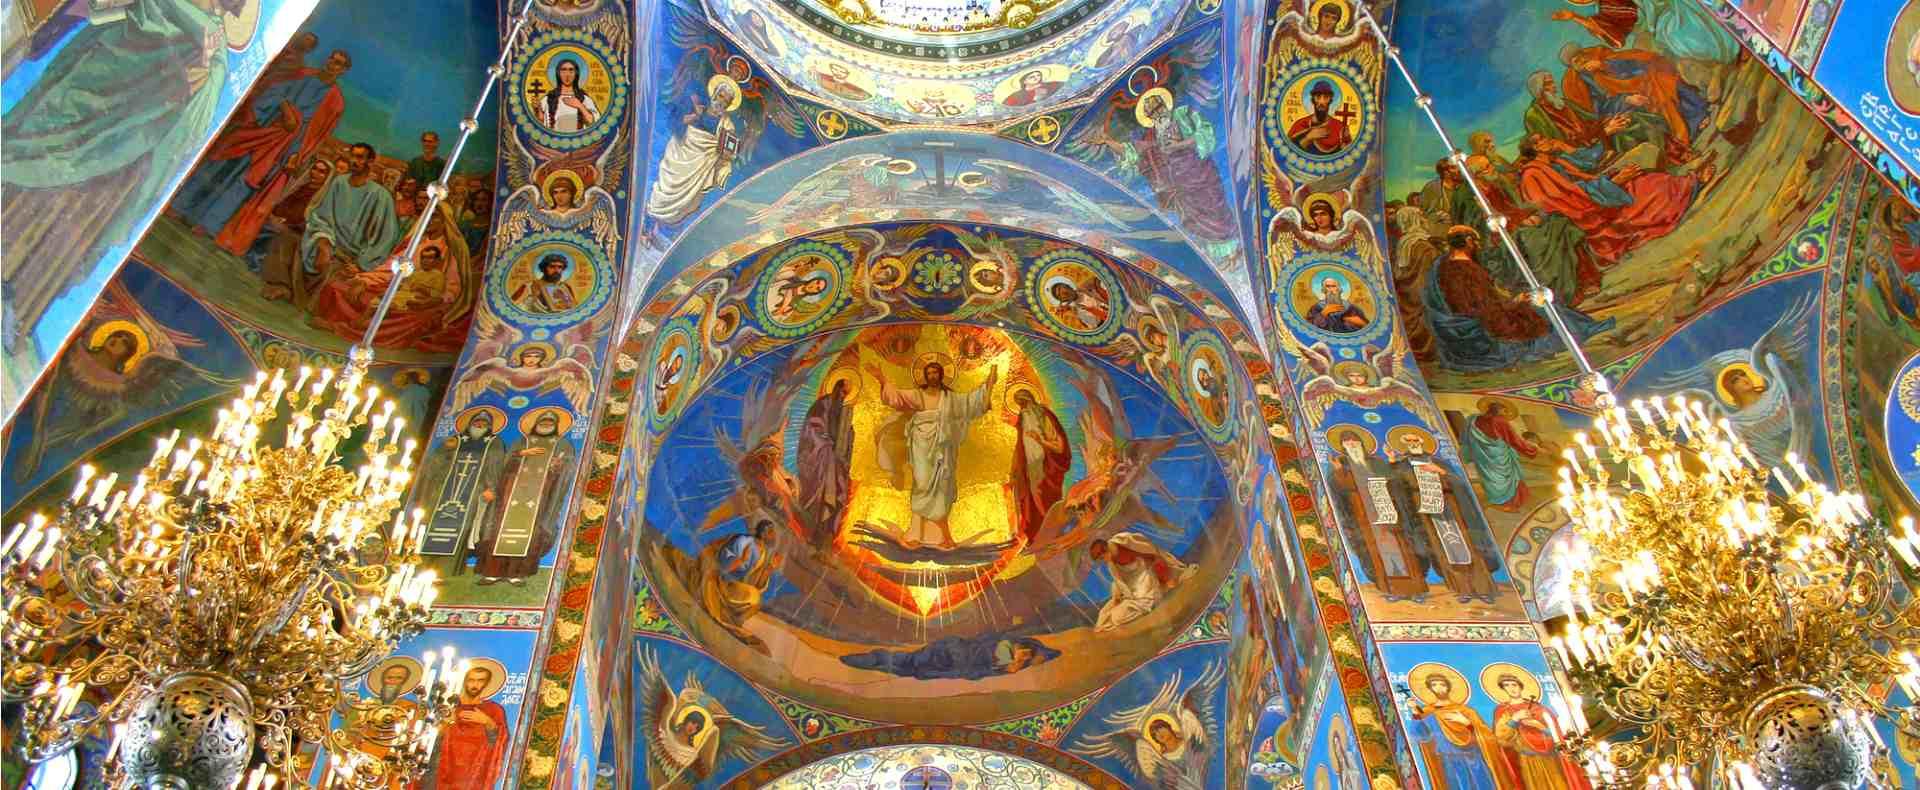 Savior on Blood, St. Petersburg, Russia